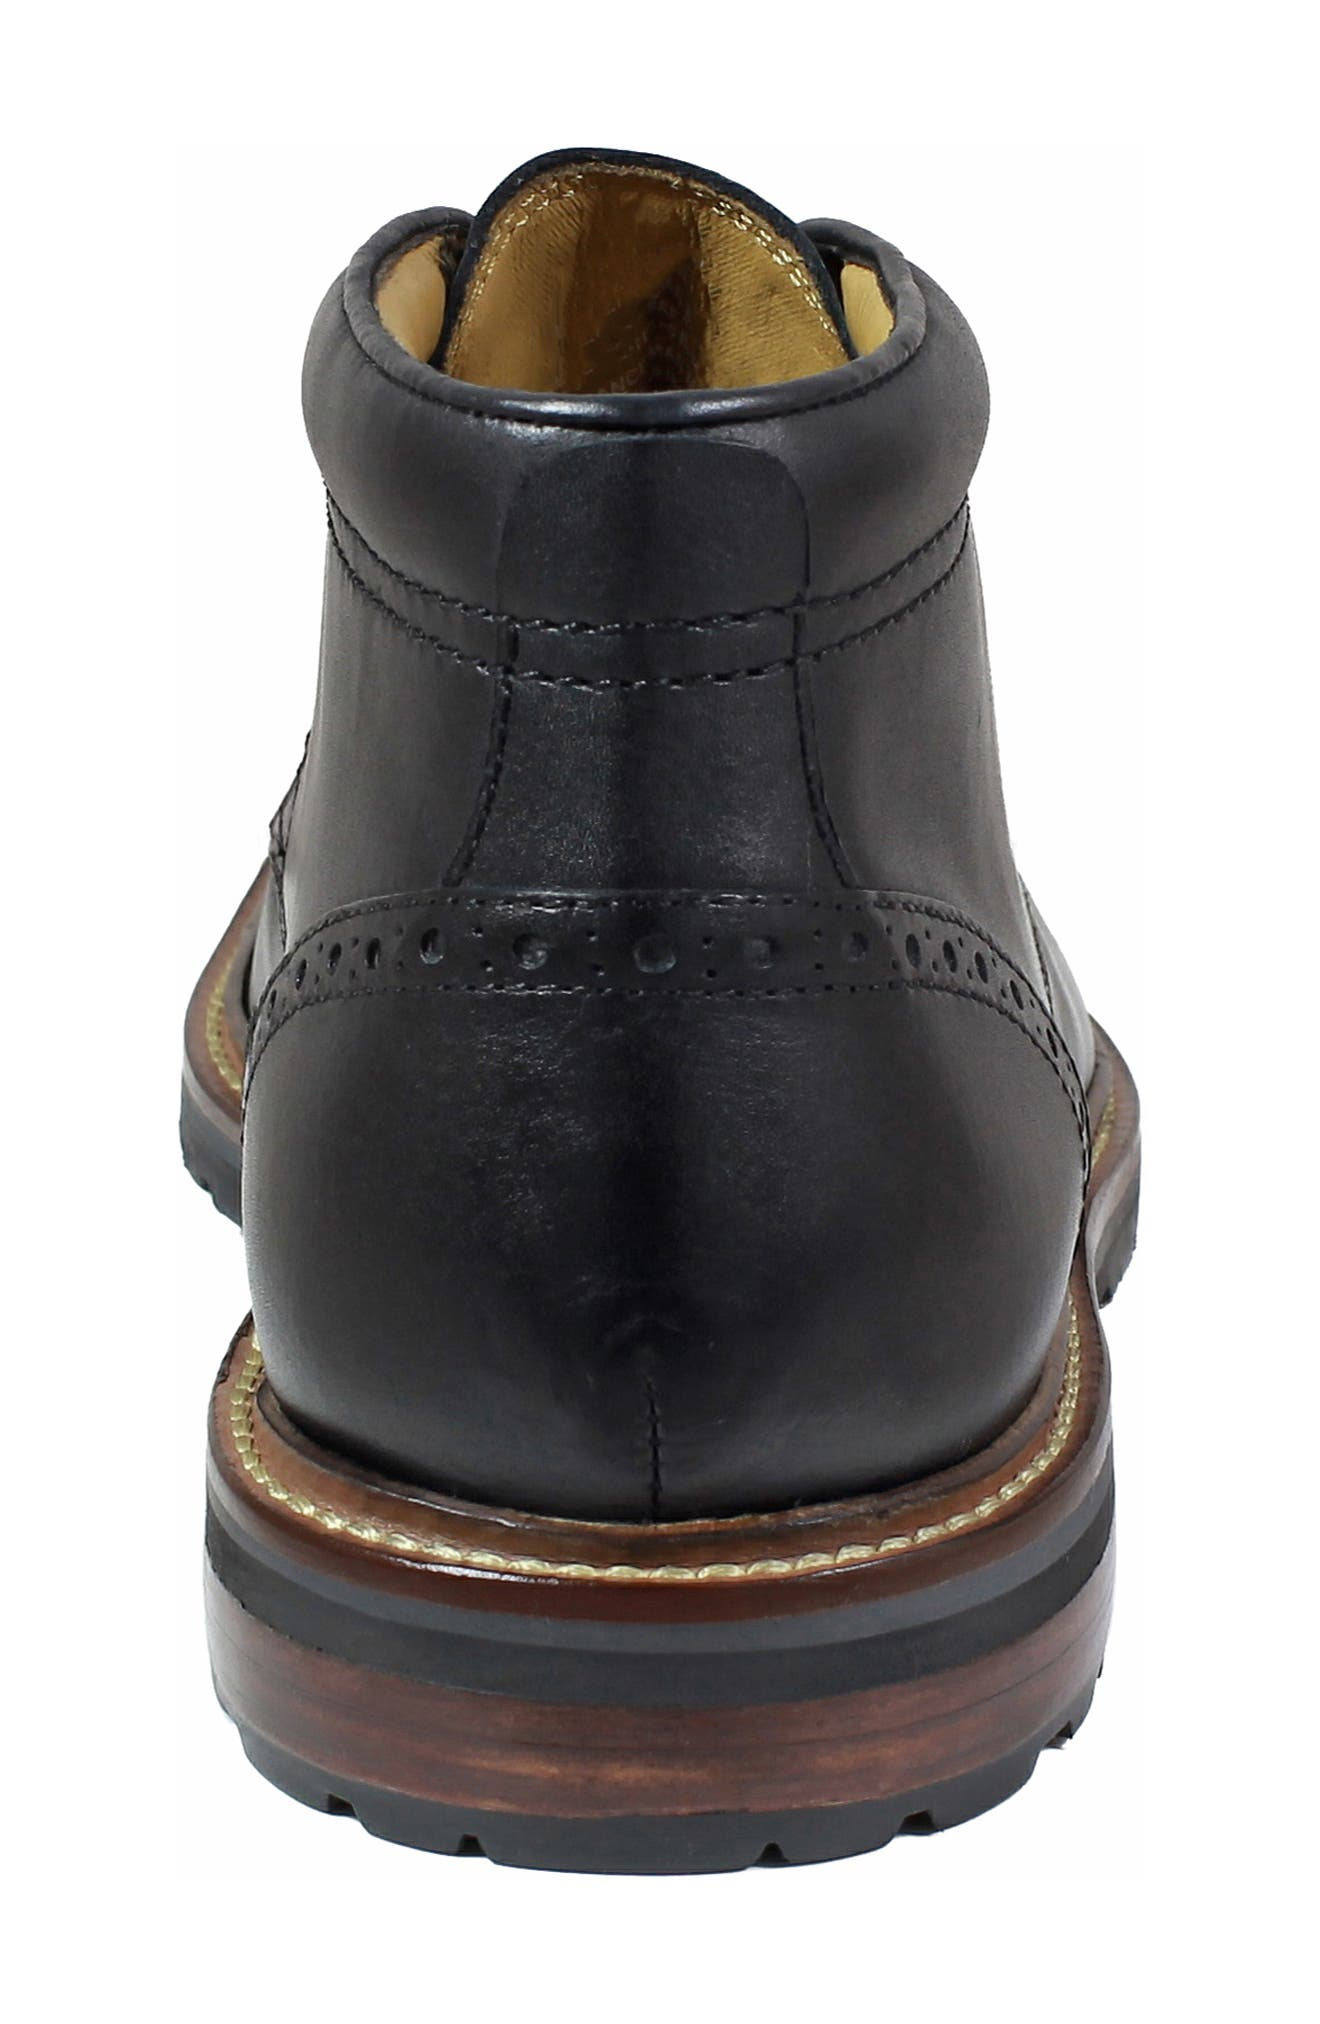 FLORSHEIM, Estabrook Lugged Chukka Boot, Alternate thumbnail 7, color, BLACK LEATHER